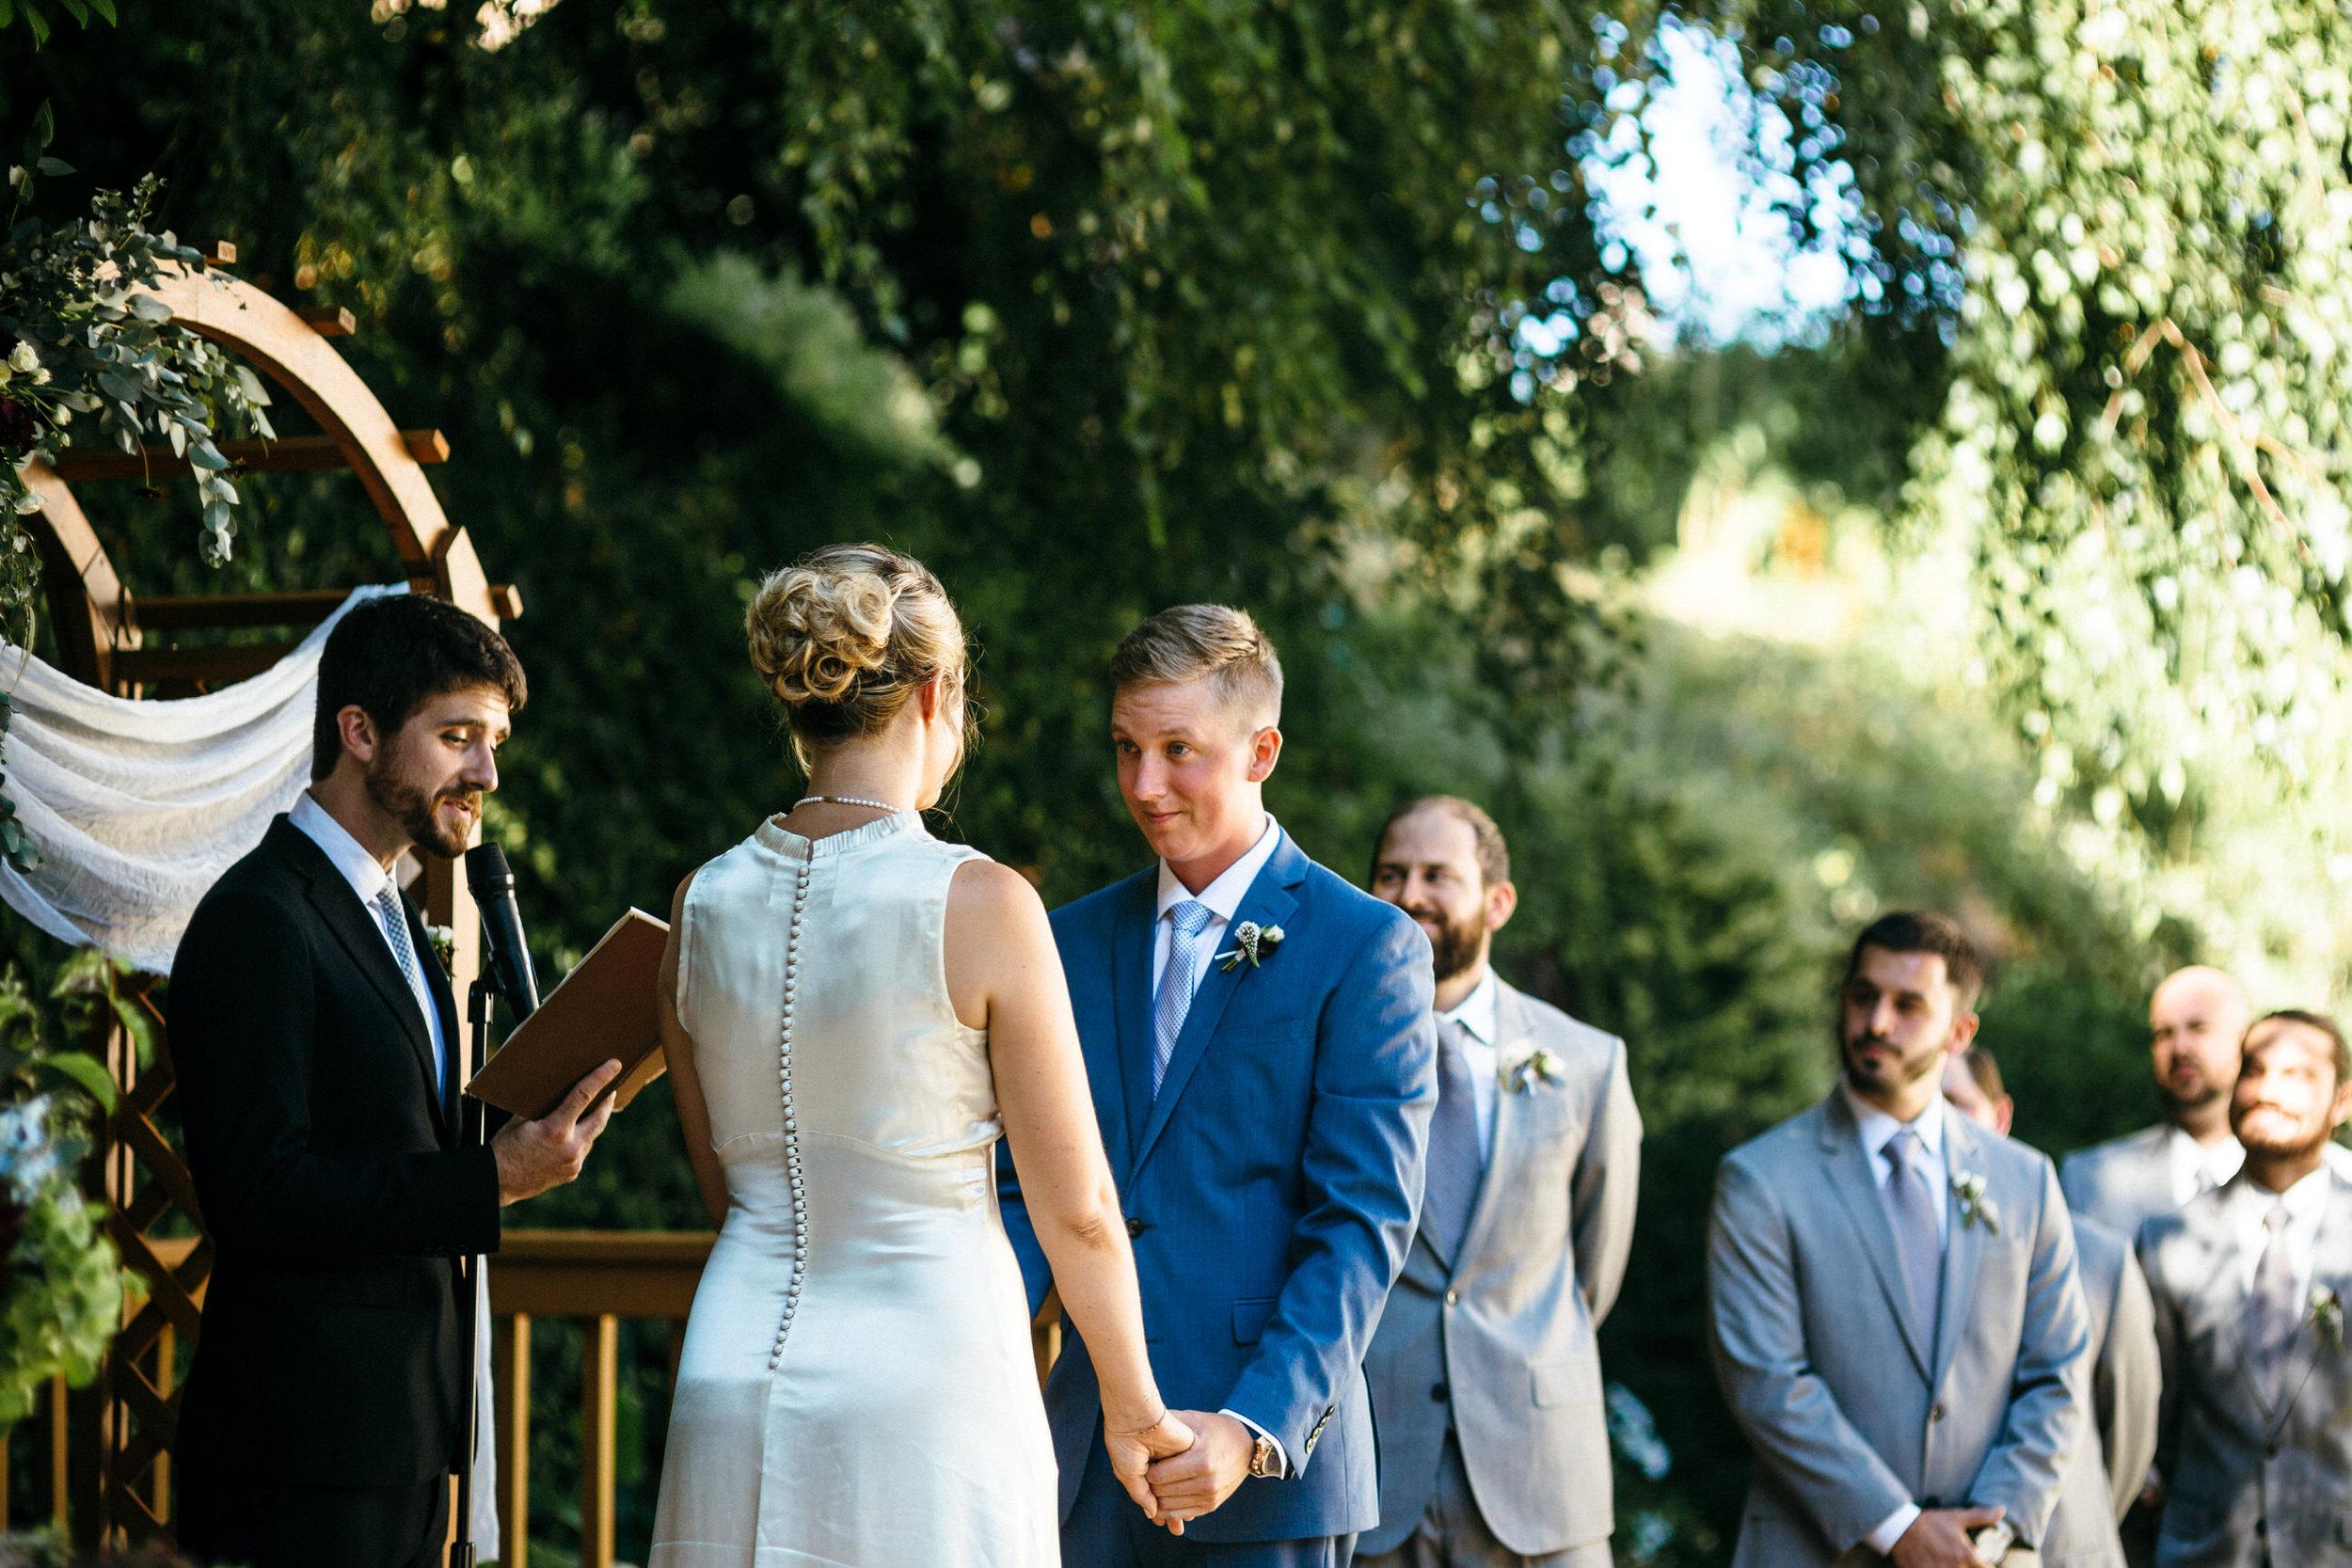 Laurelhurst Park club wedding photographer Portand pdx Oregon057.JPG